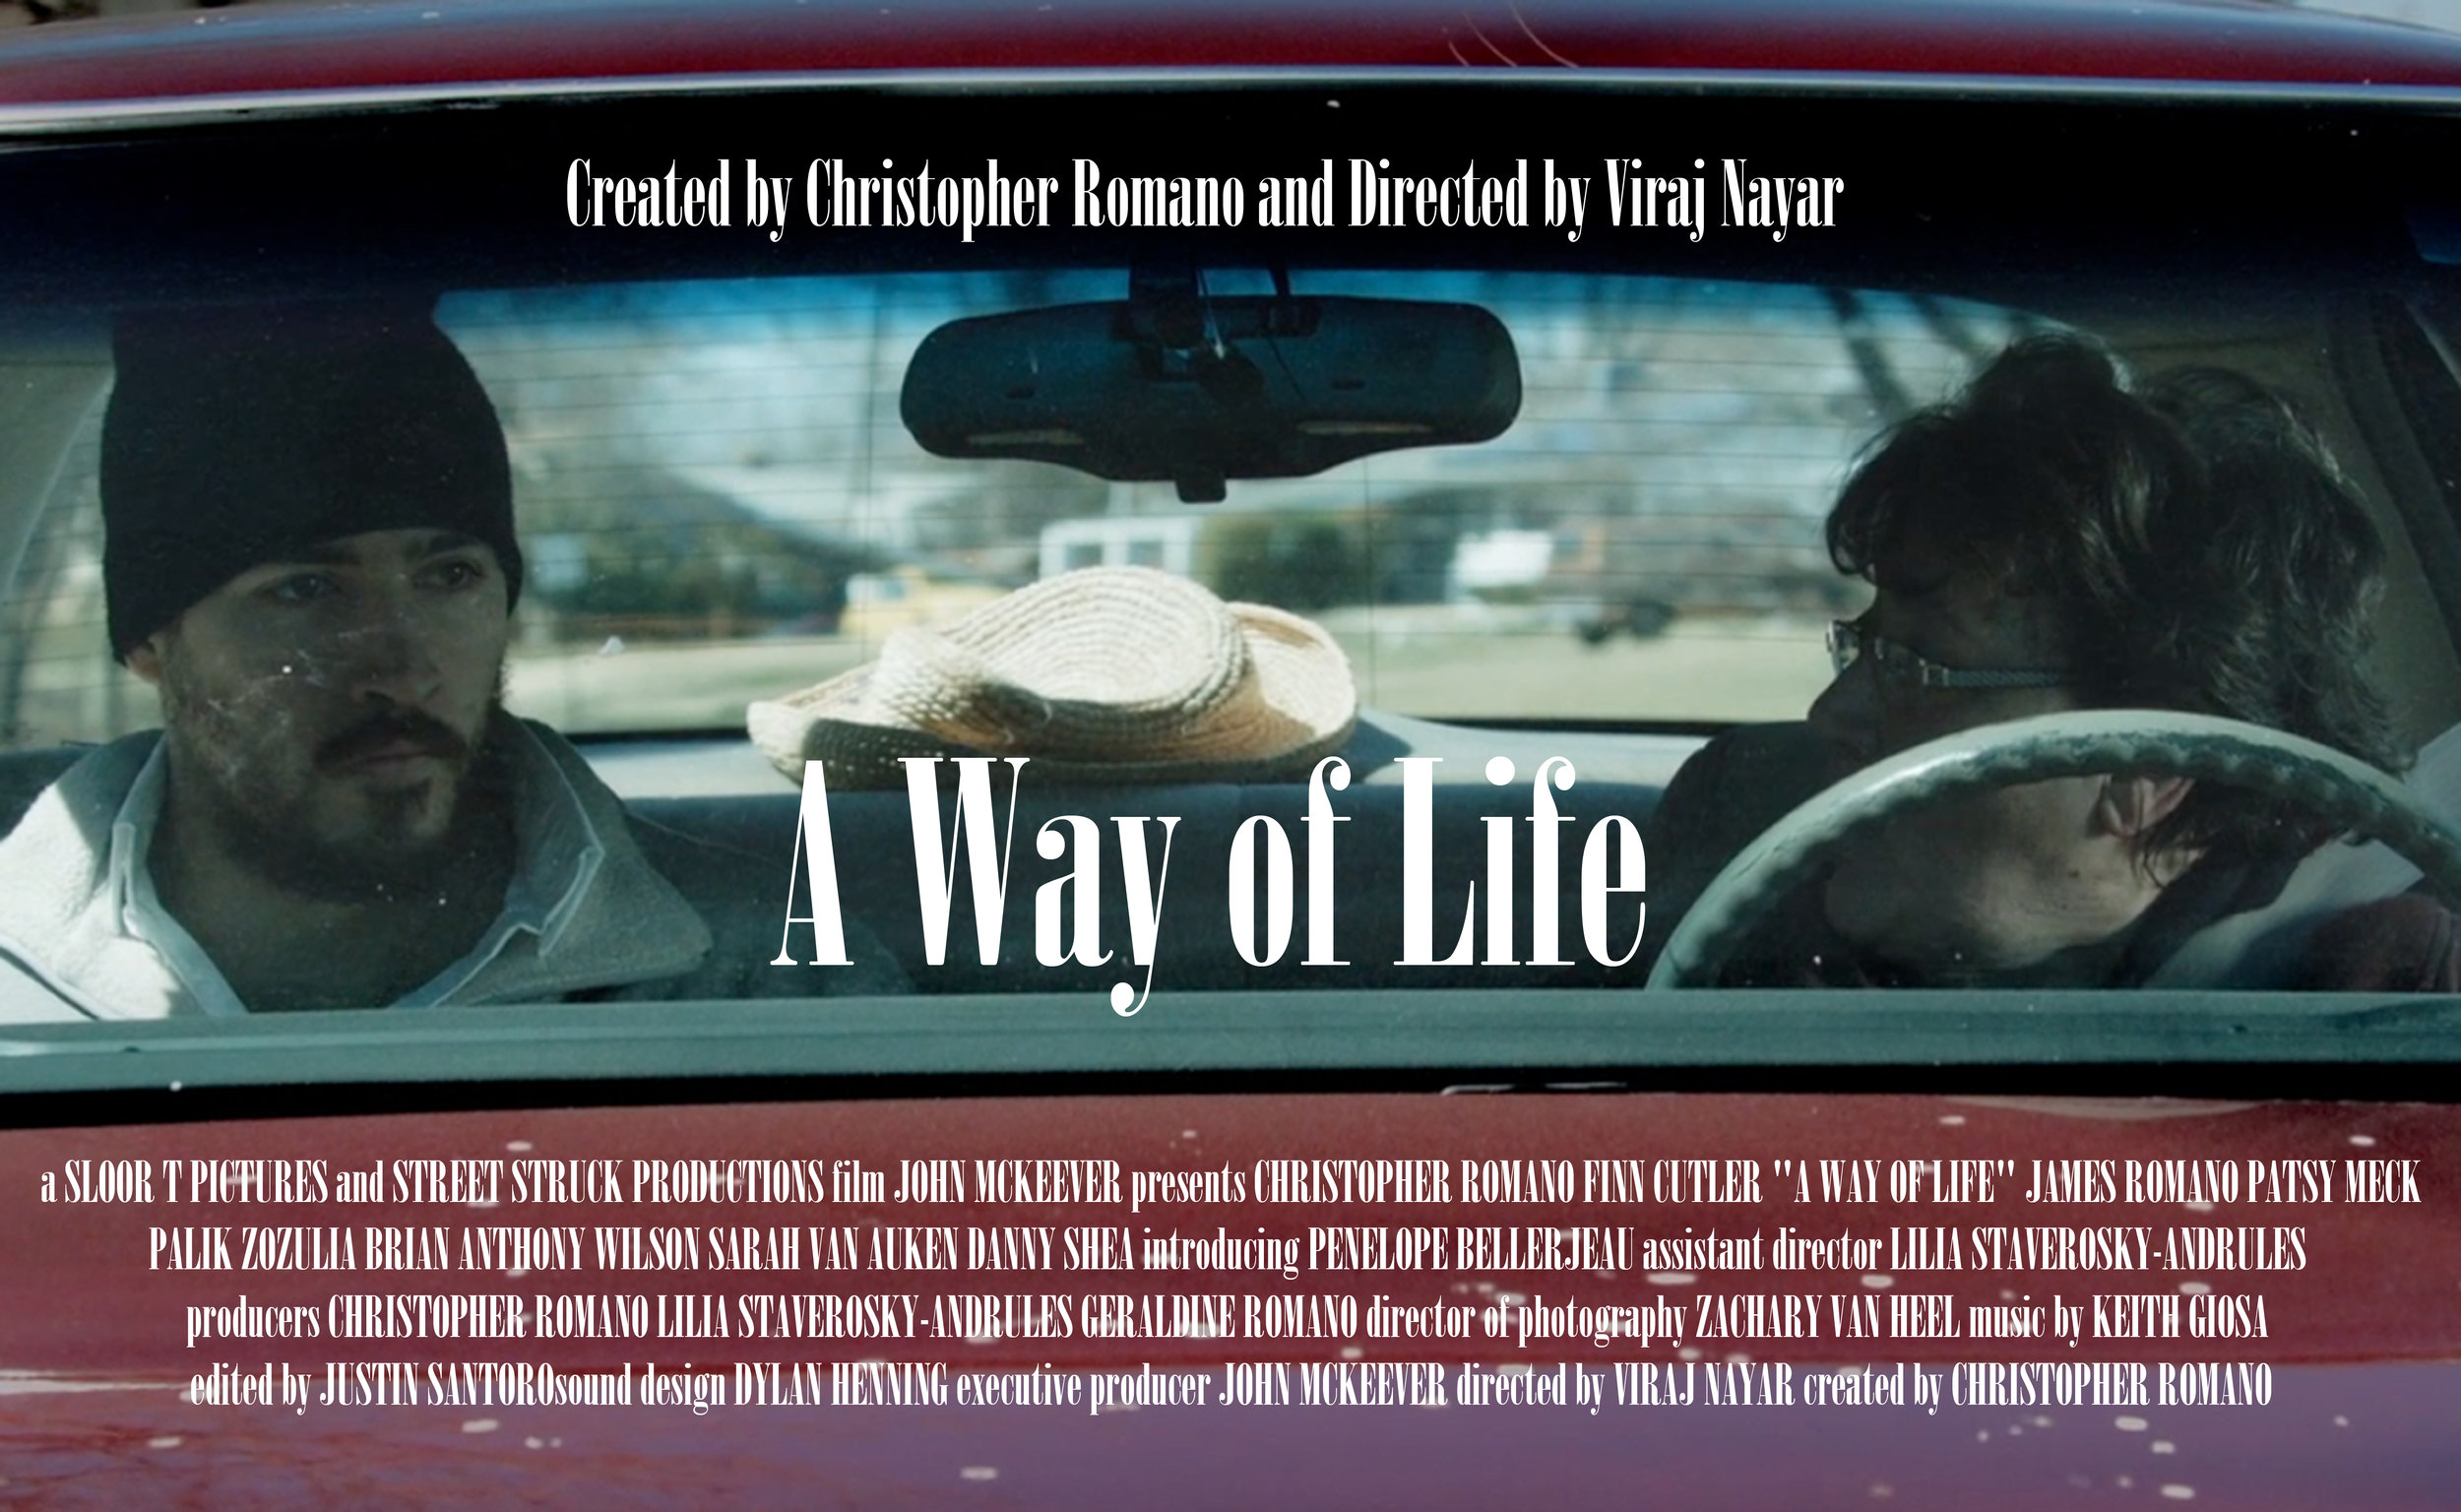 A-Way-of-Life-Presskit-Poster.jpg